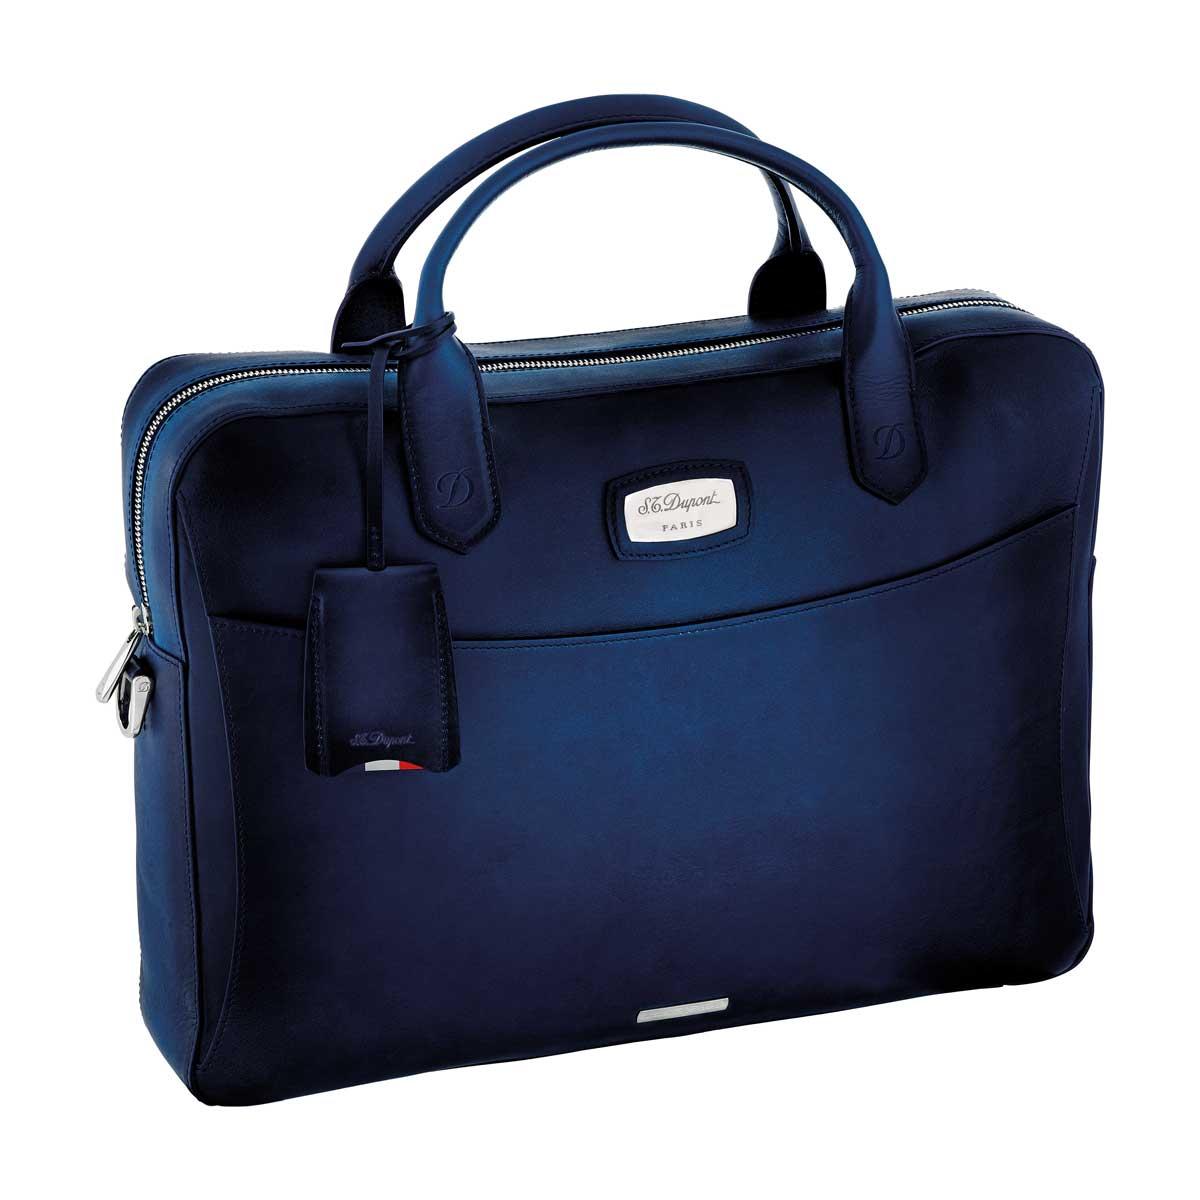 St dupont atelier midnight blue leather laptop bag for Document holder bag